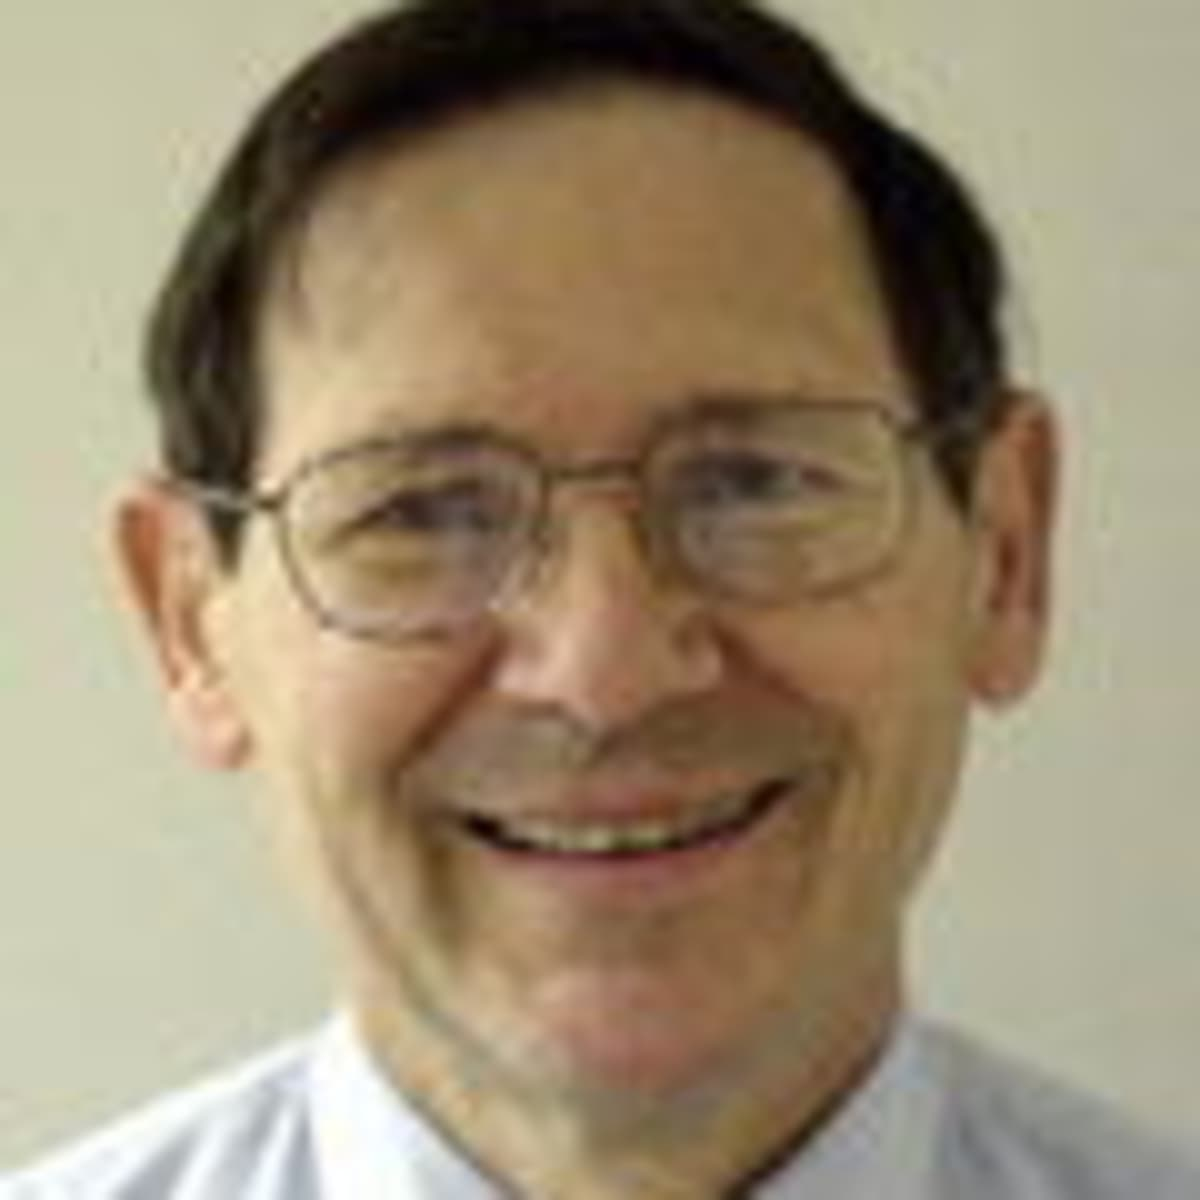 Dr. Richard Rosenbaum, MD, FAAP